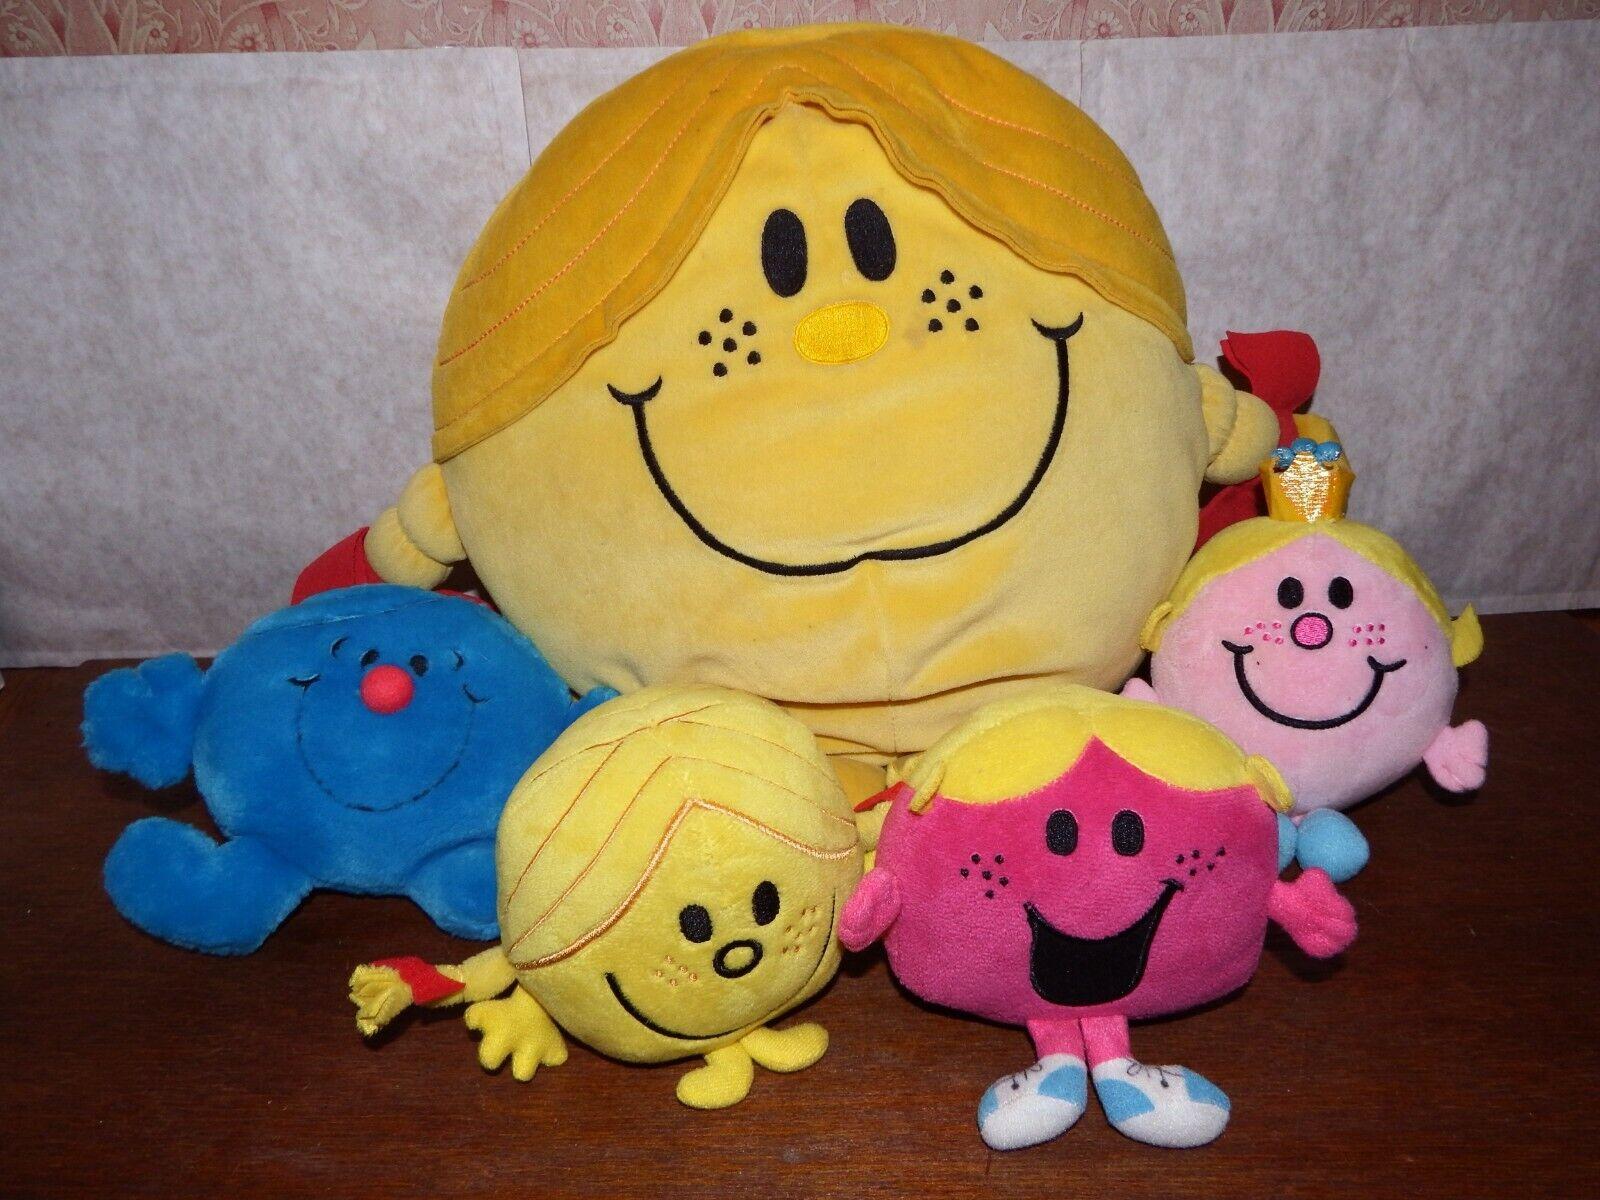 Bundle Mr Men & Little Miss soft soft soft plush figure toy playset Perfect Sunshine Chat 2b53a8